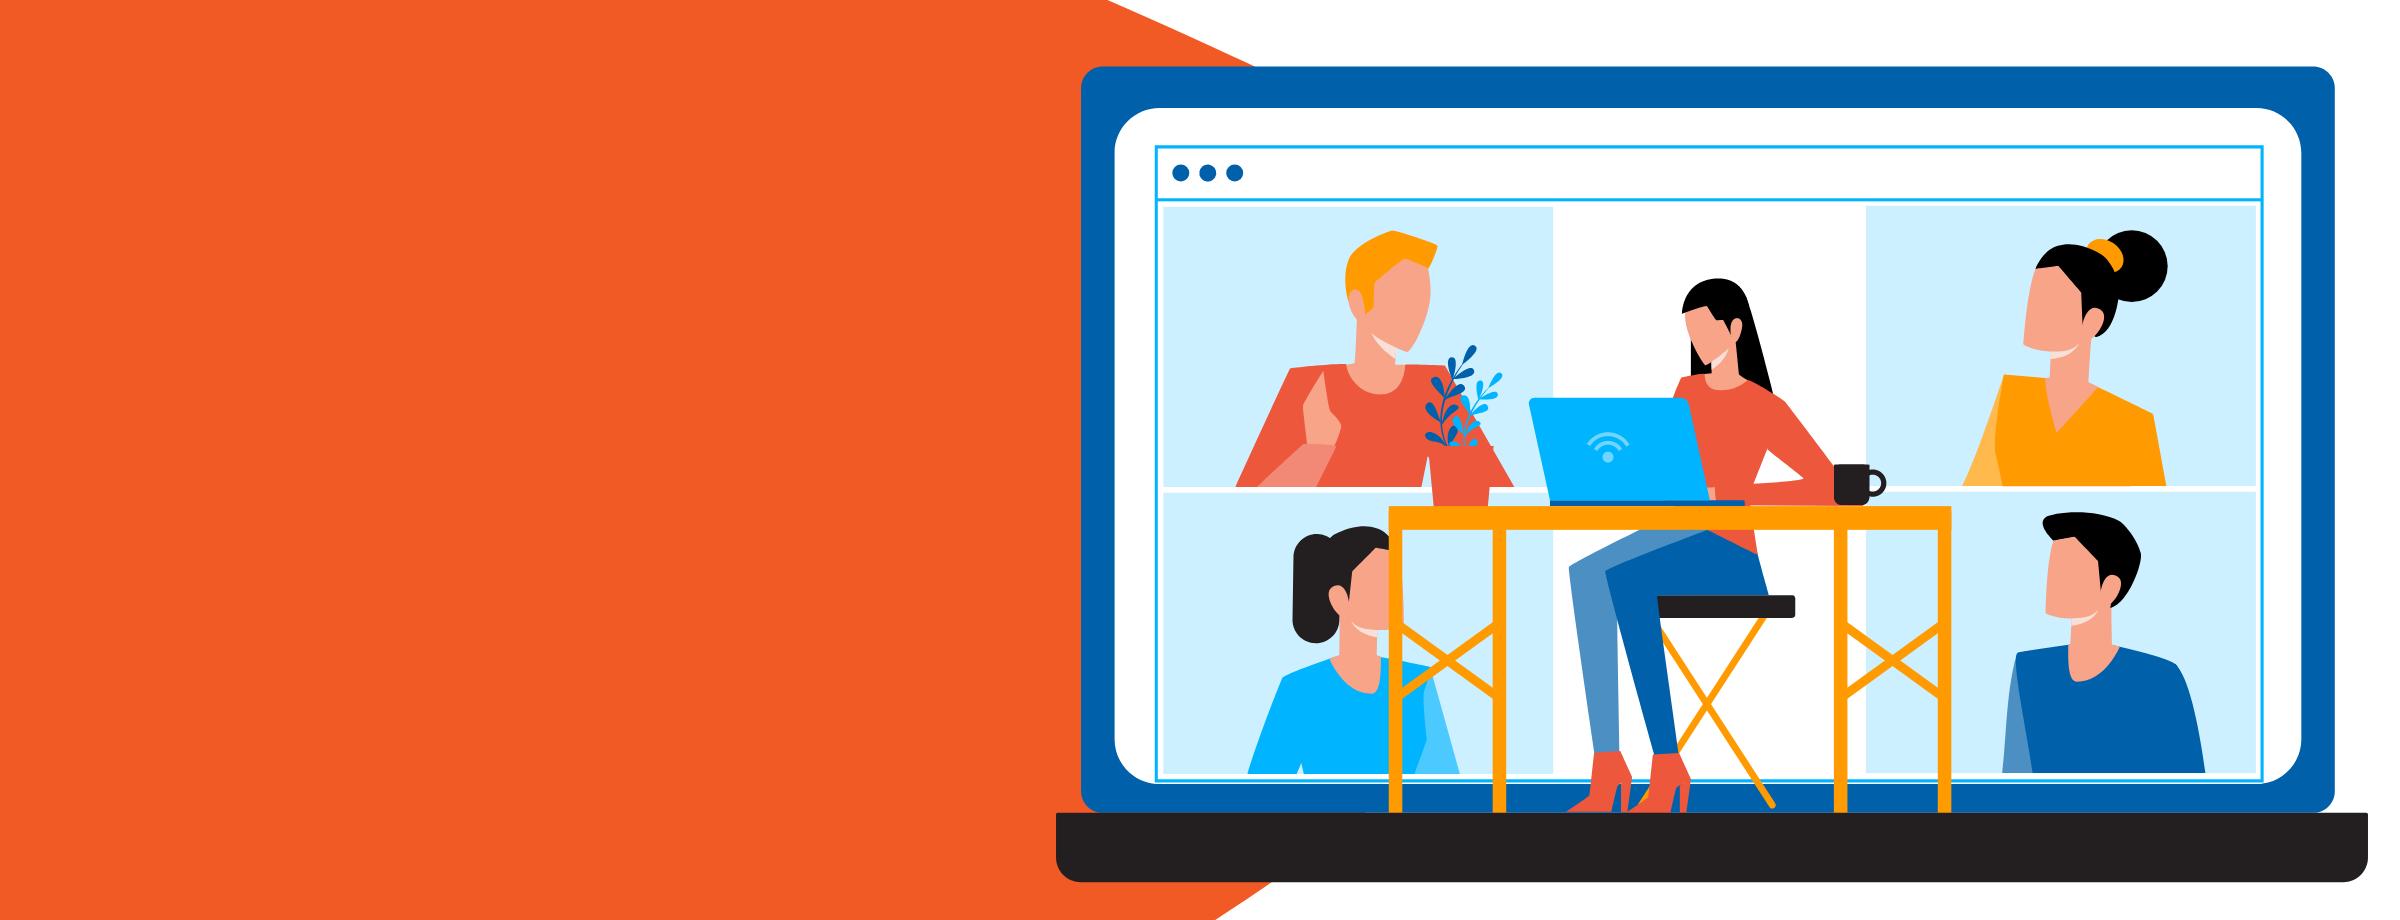 Why Microsoft Teams is the hub for teamwork